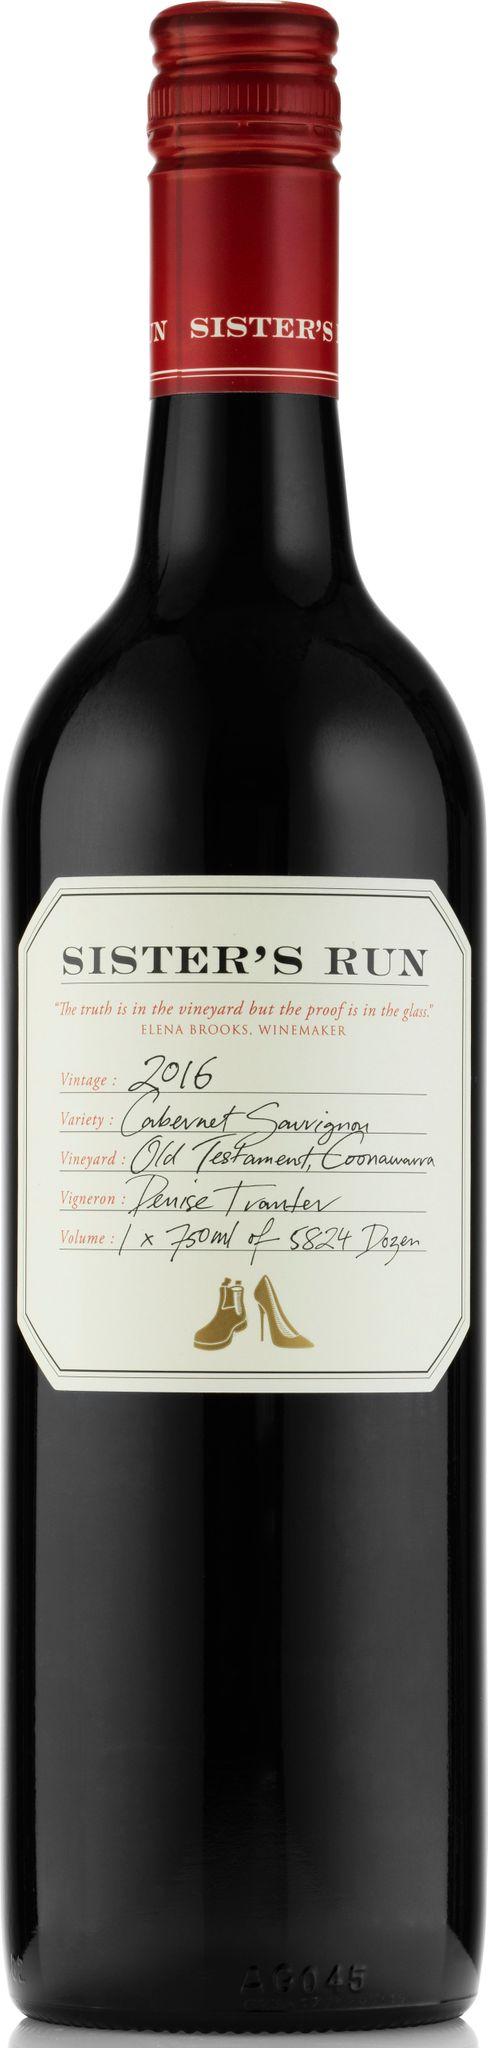 Produktbild på Sister's Run Old Testament Coonawarra